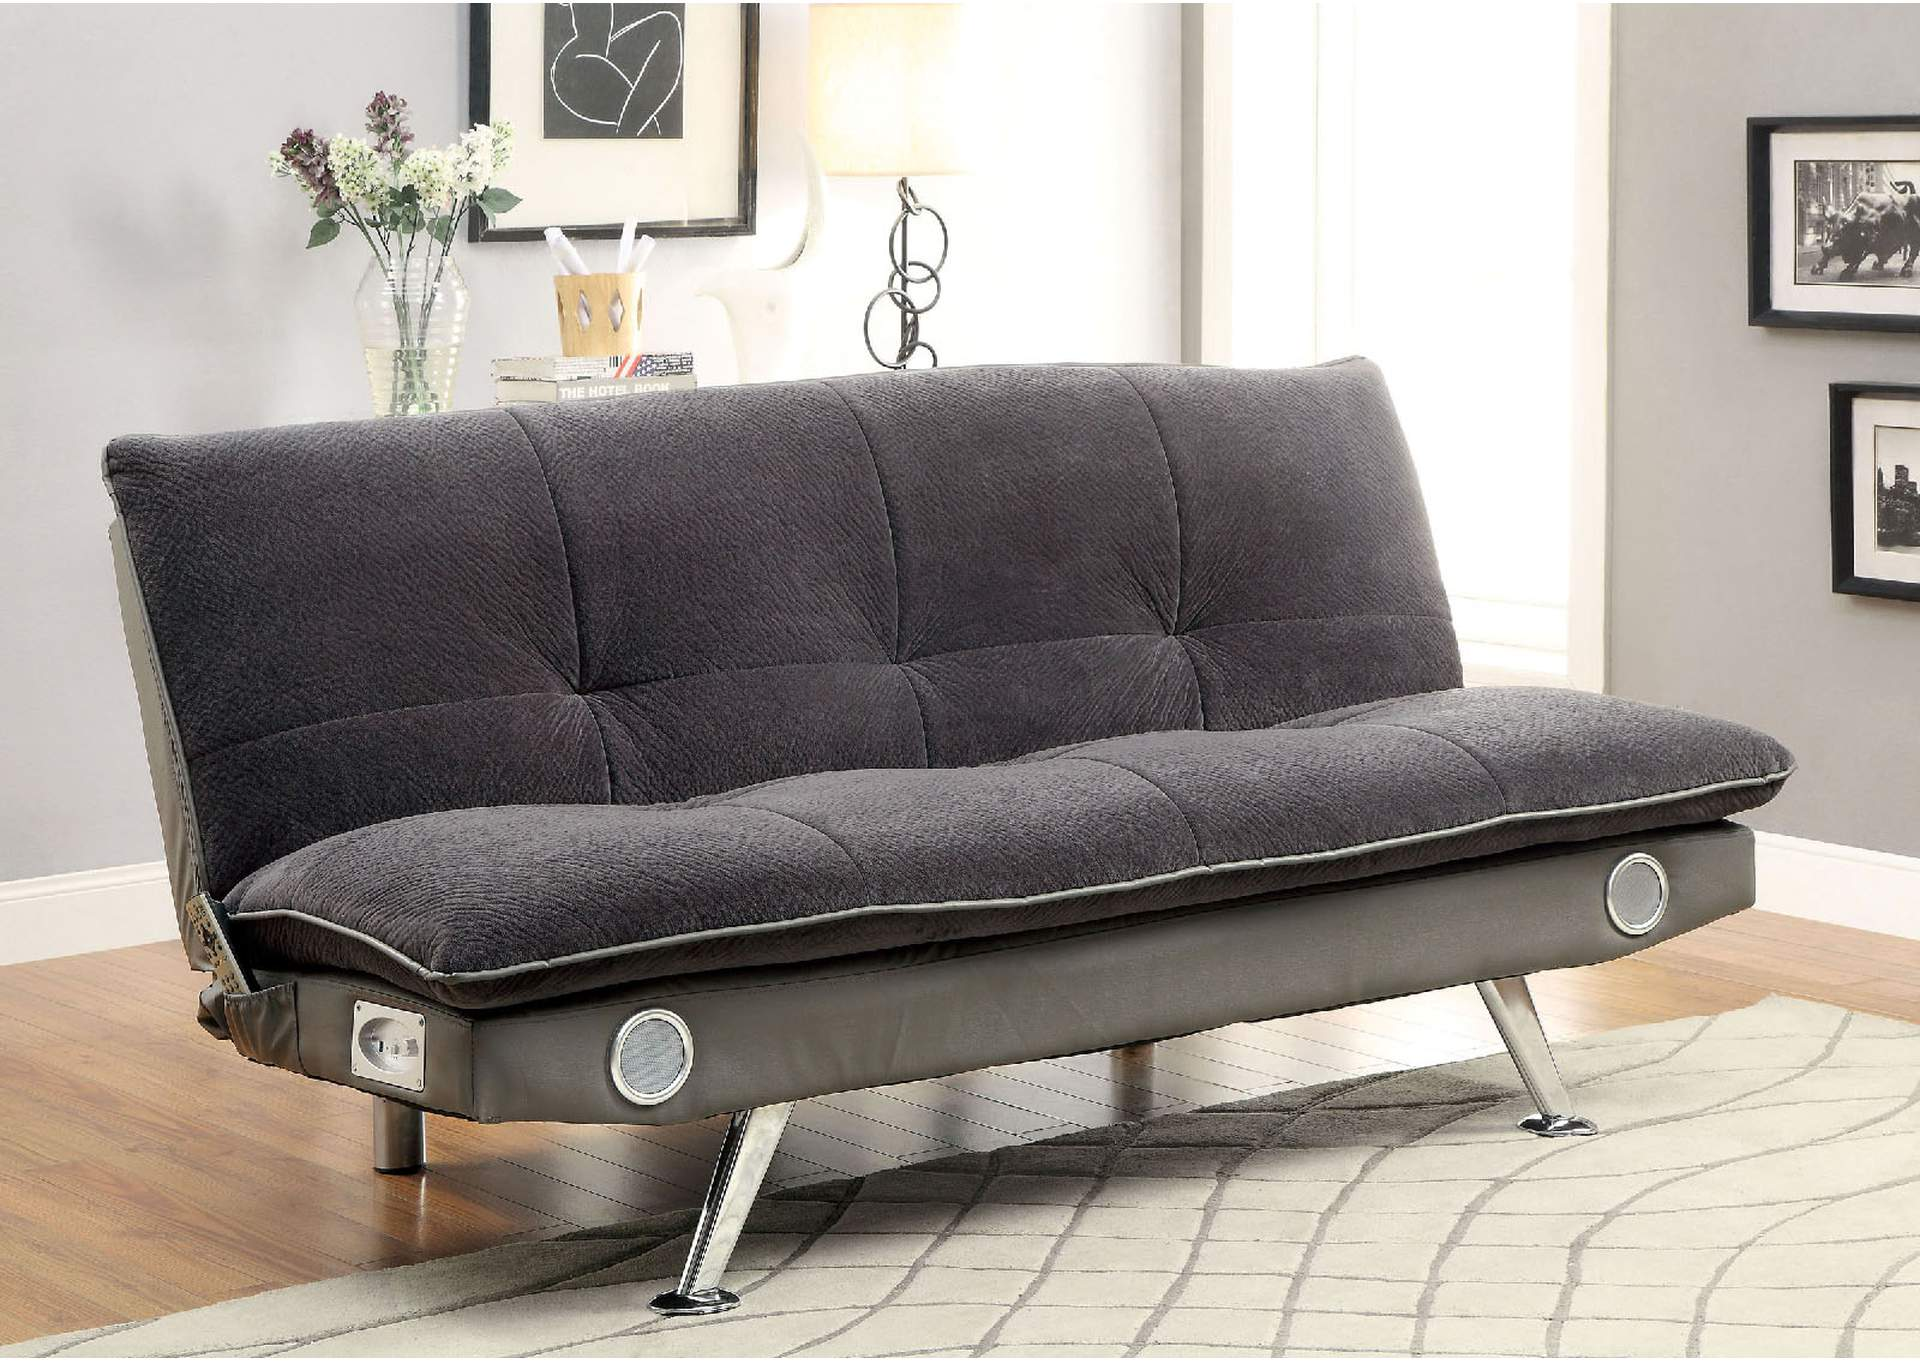 Gallagher Gray Futon Sofa W/ Bluetooth Speaker,Furniture Of America